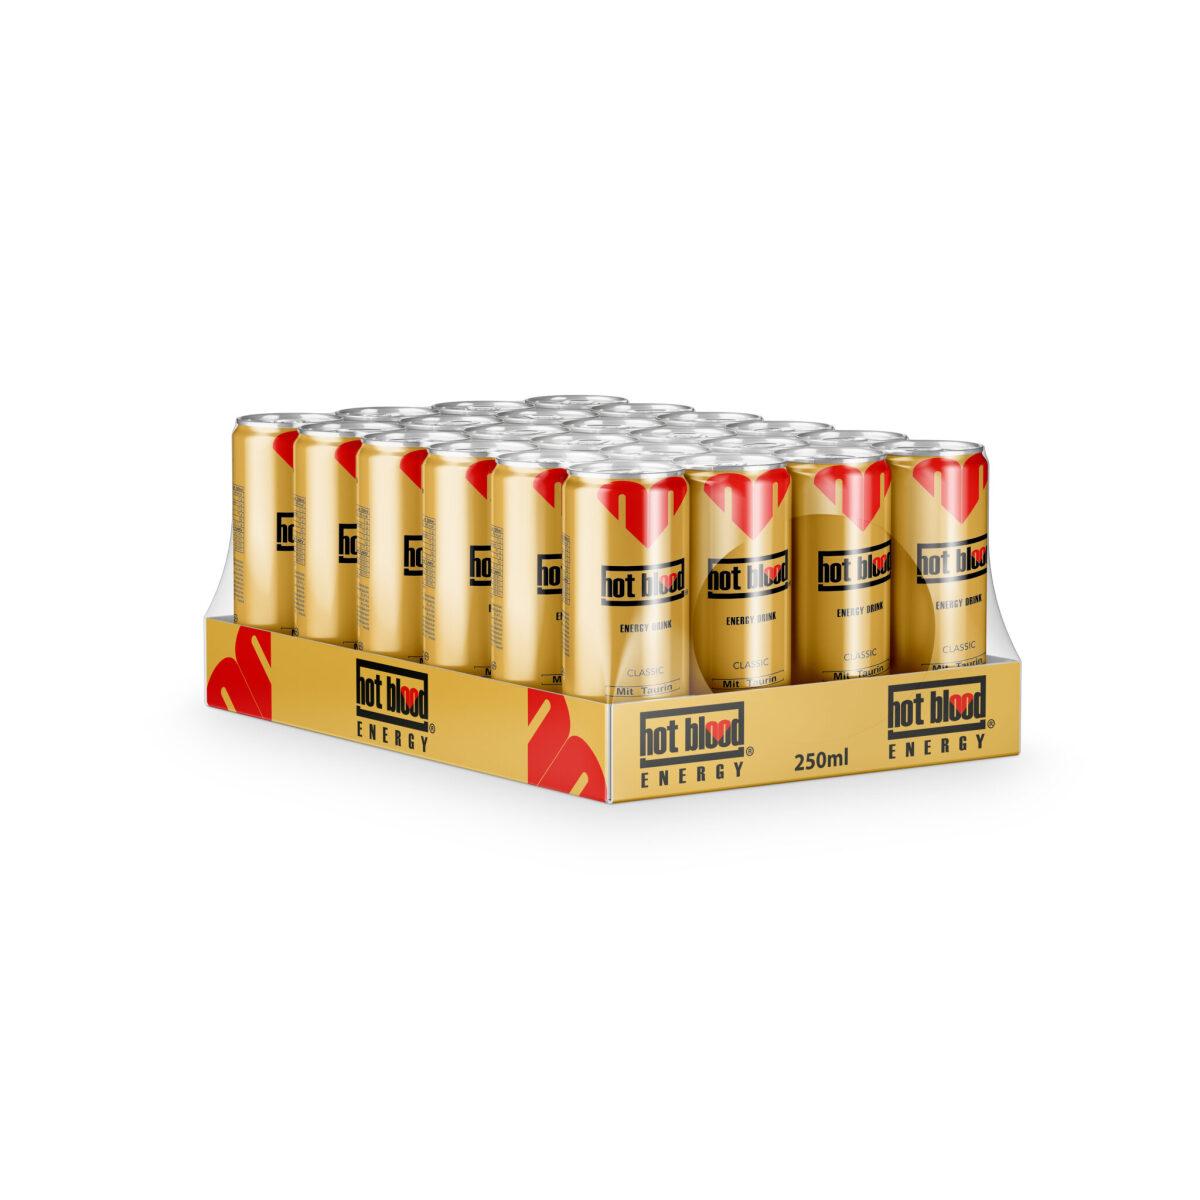 24 x Hot Blood Ice Tea Pfirsich 330ml